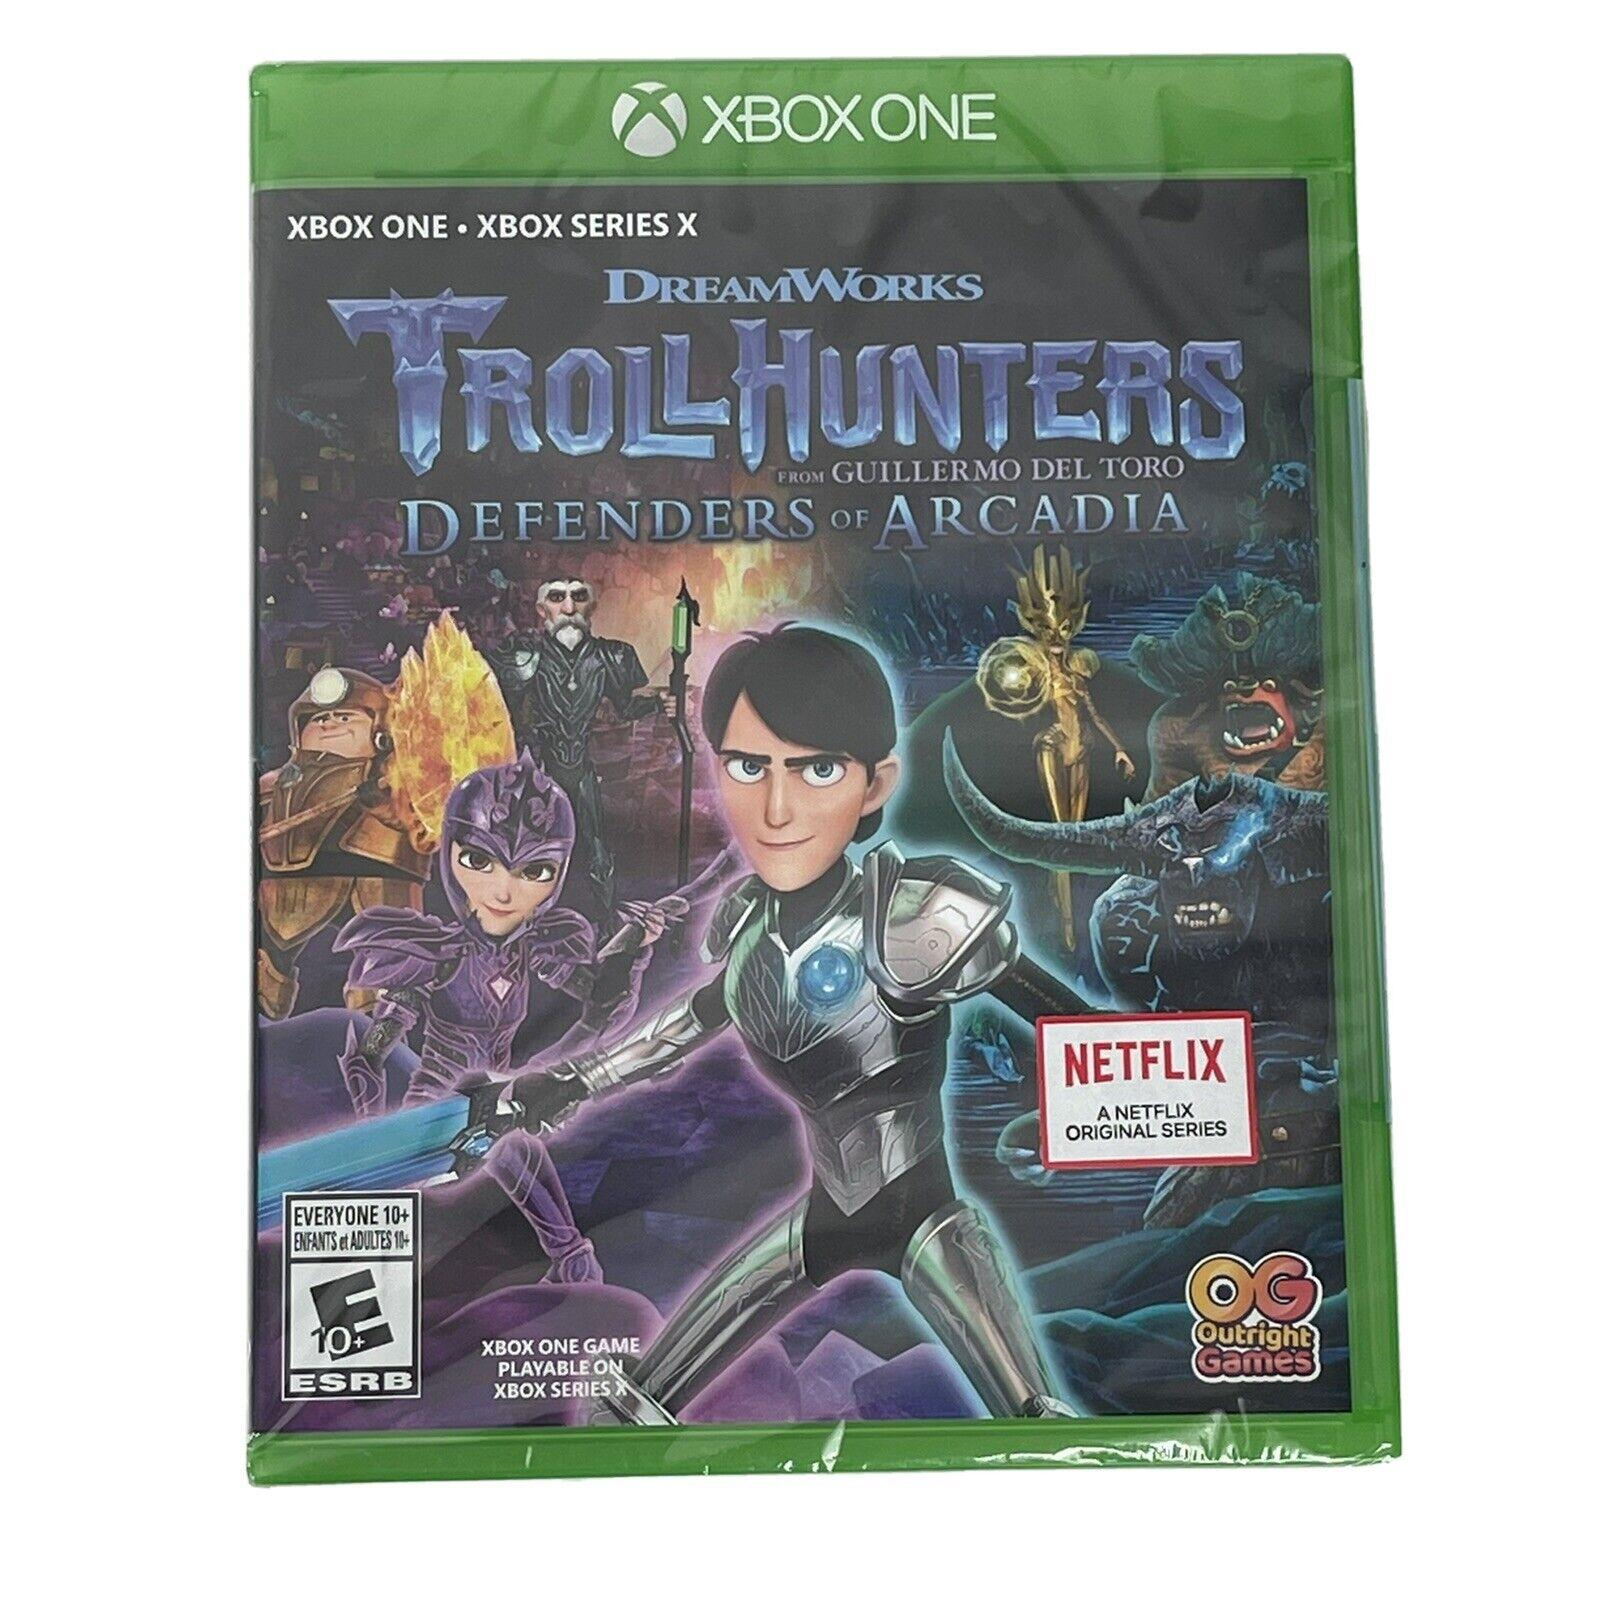 Dreamworks TrollHunters Defenders of Arcadia Xbox One Series X New Troll Hunters